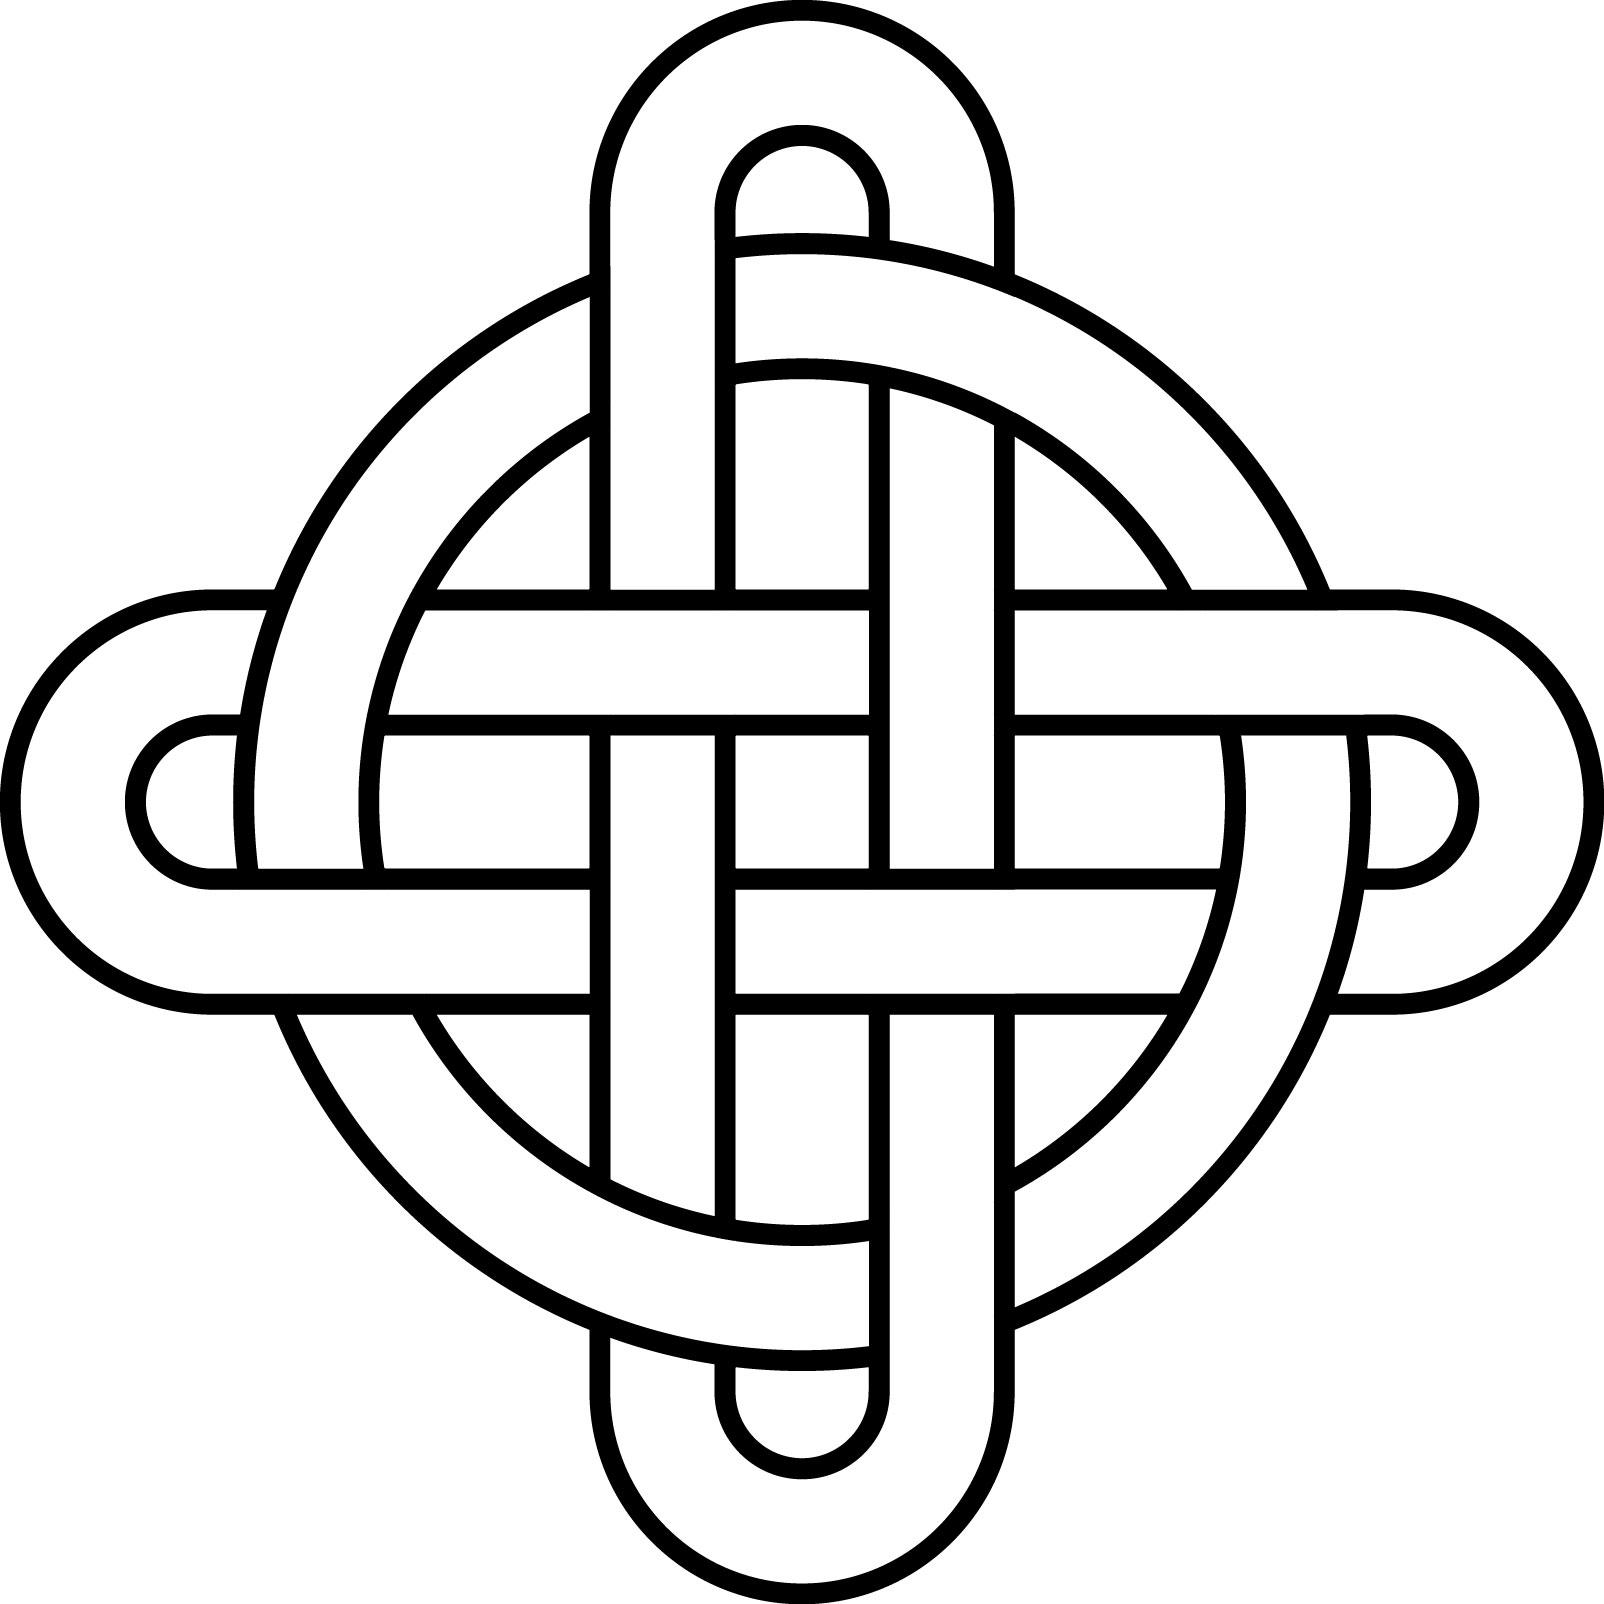 High Resolution Wallpaper | Celtic Knot 1604x1604 px